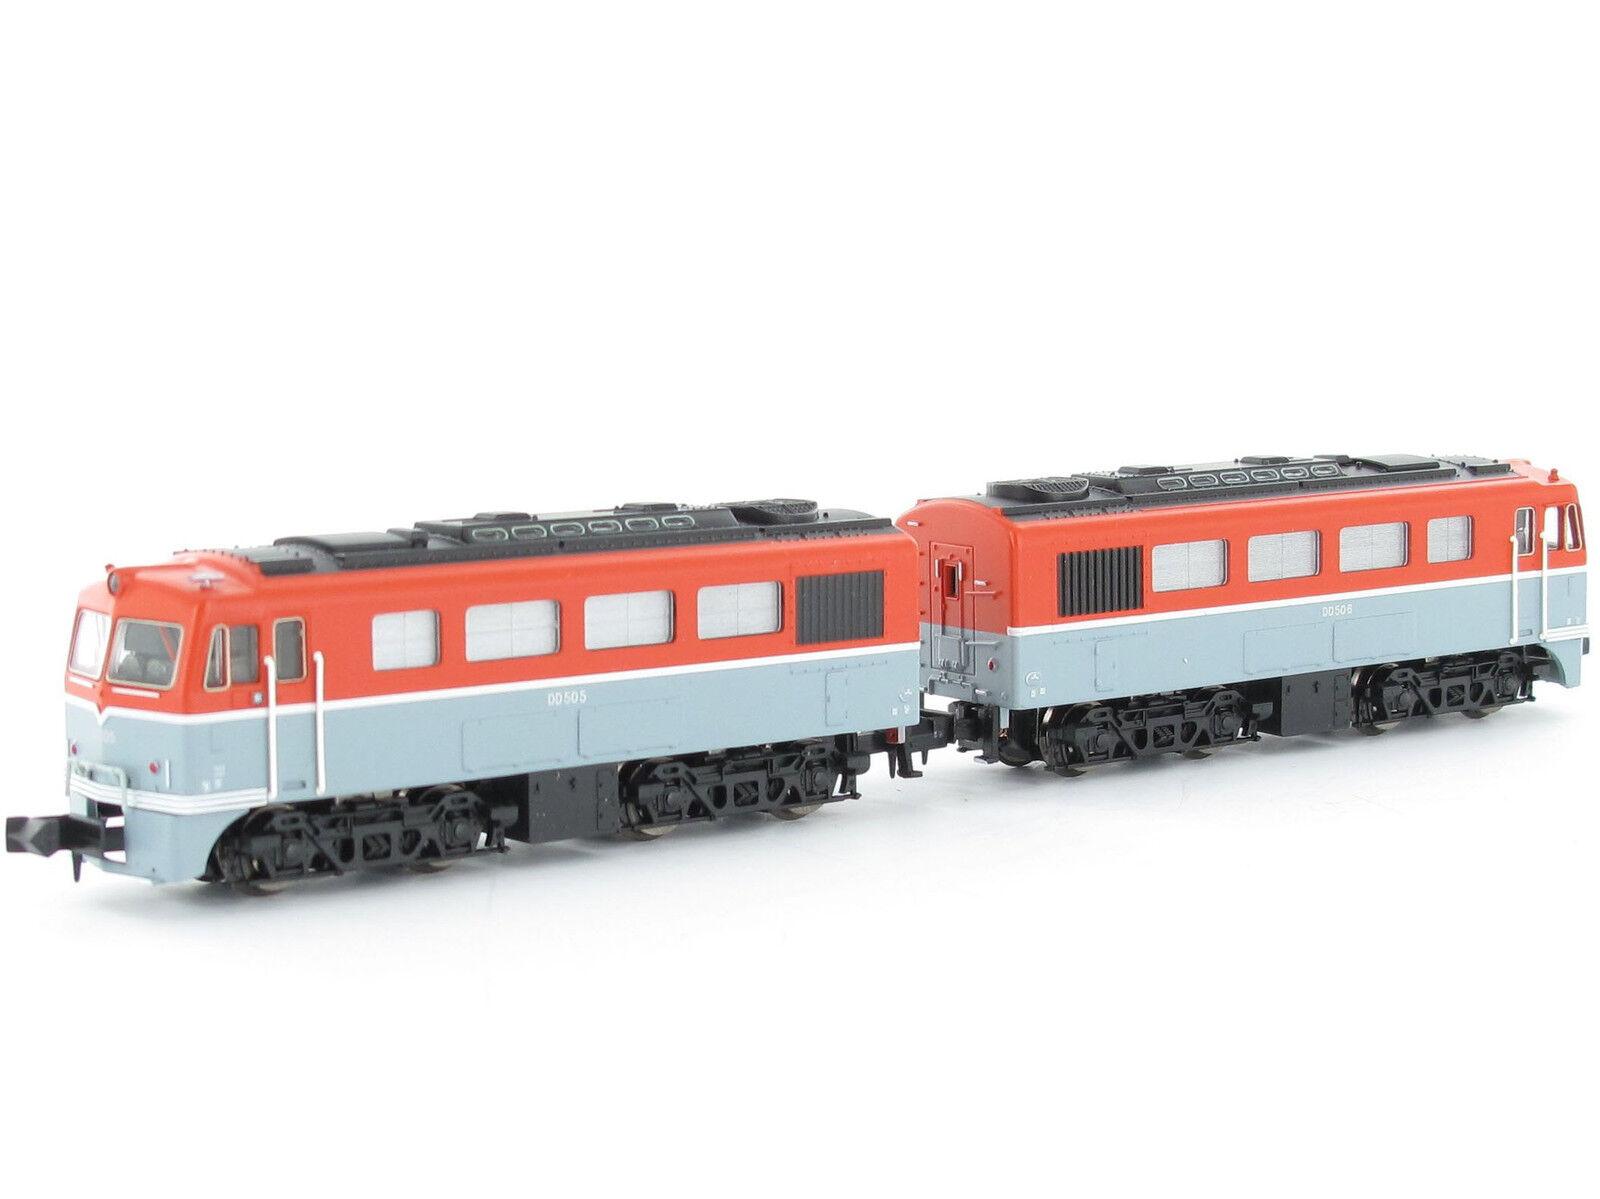 Microce a8909 - dieselok dd50 - 2 dopelektrook - Spur n - neu